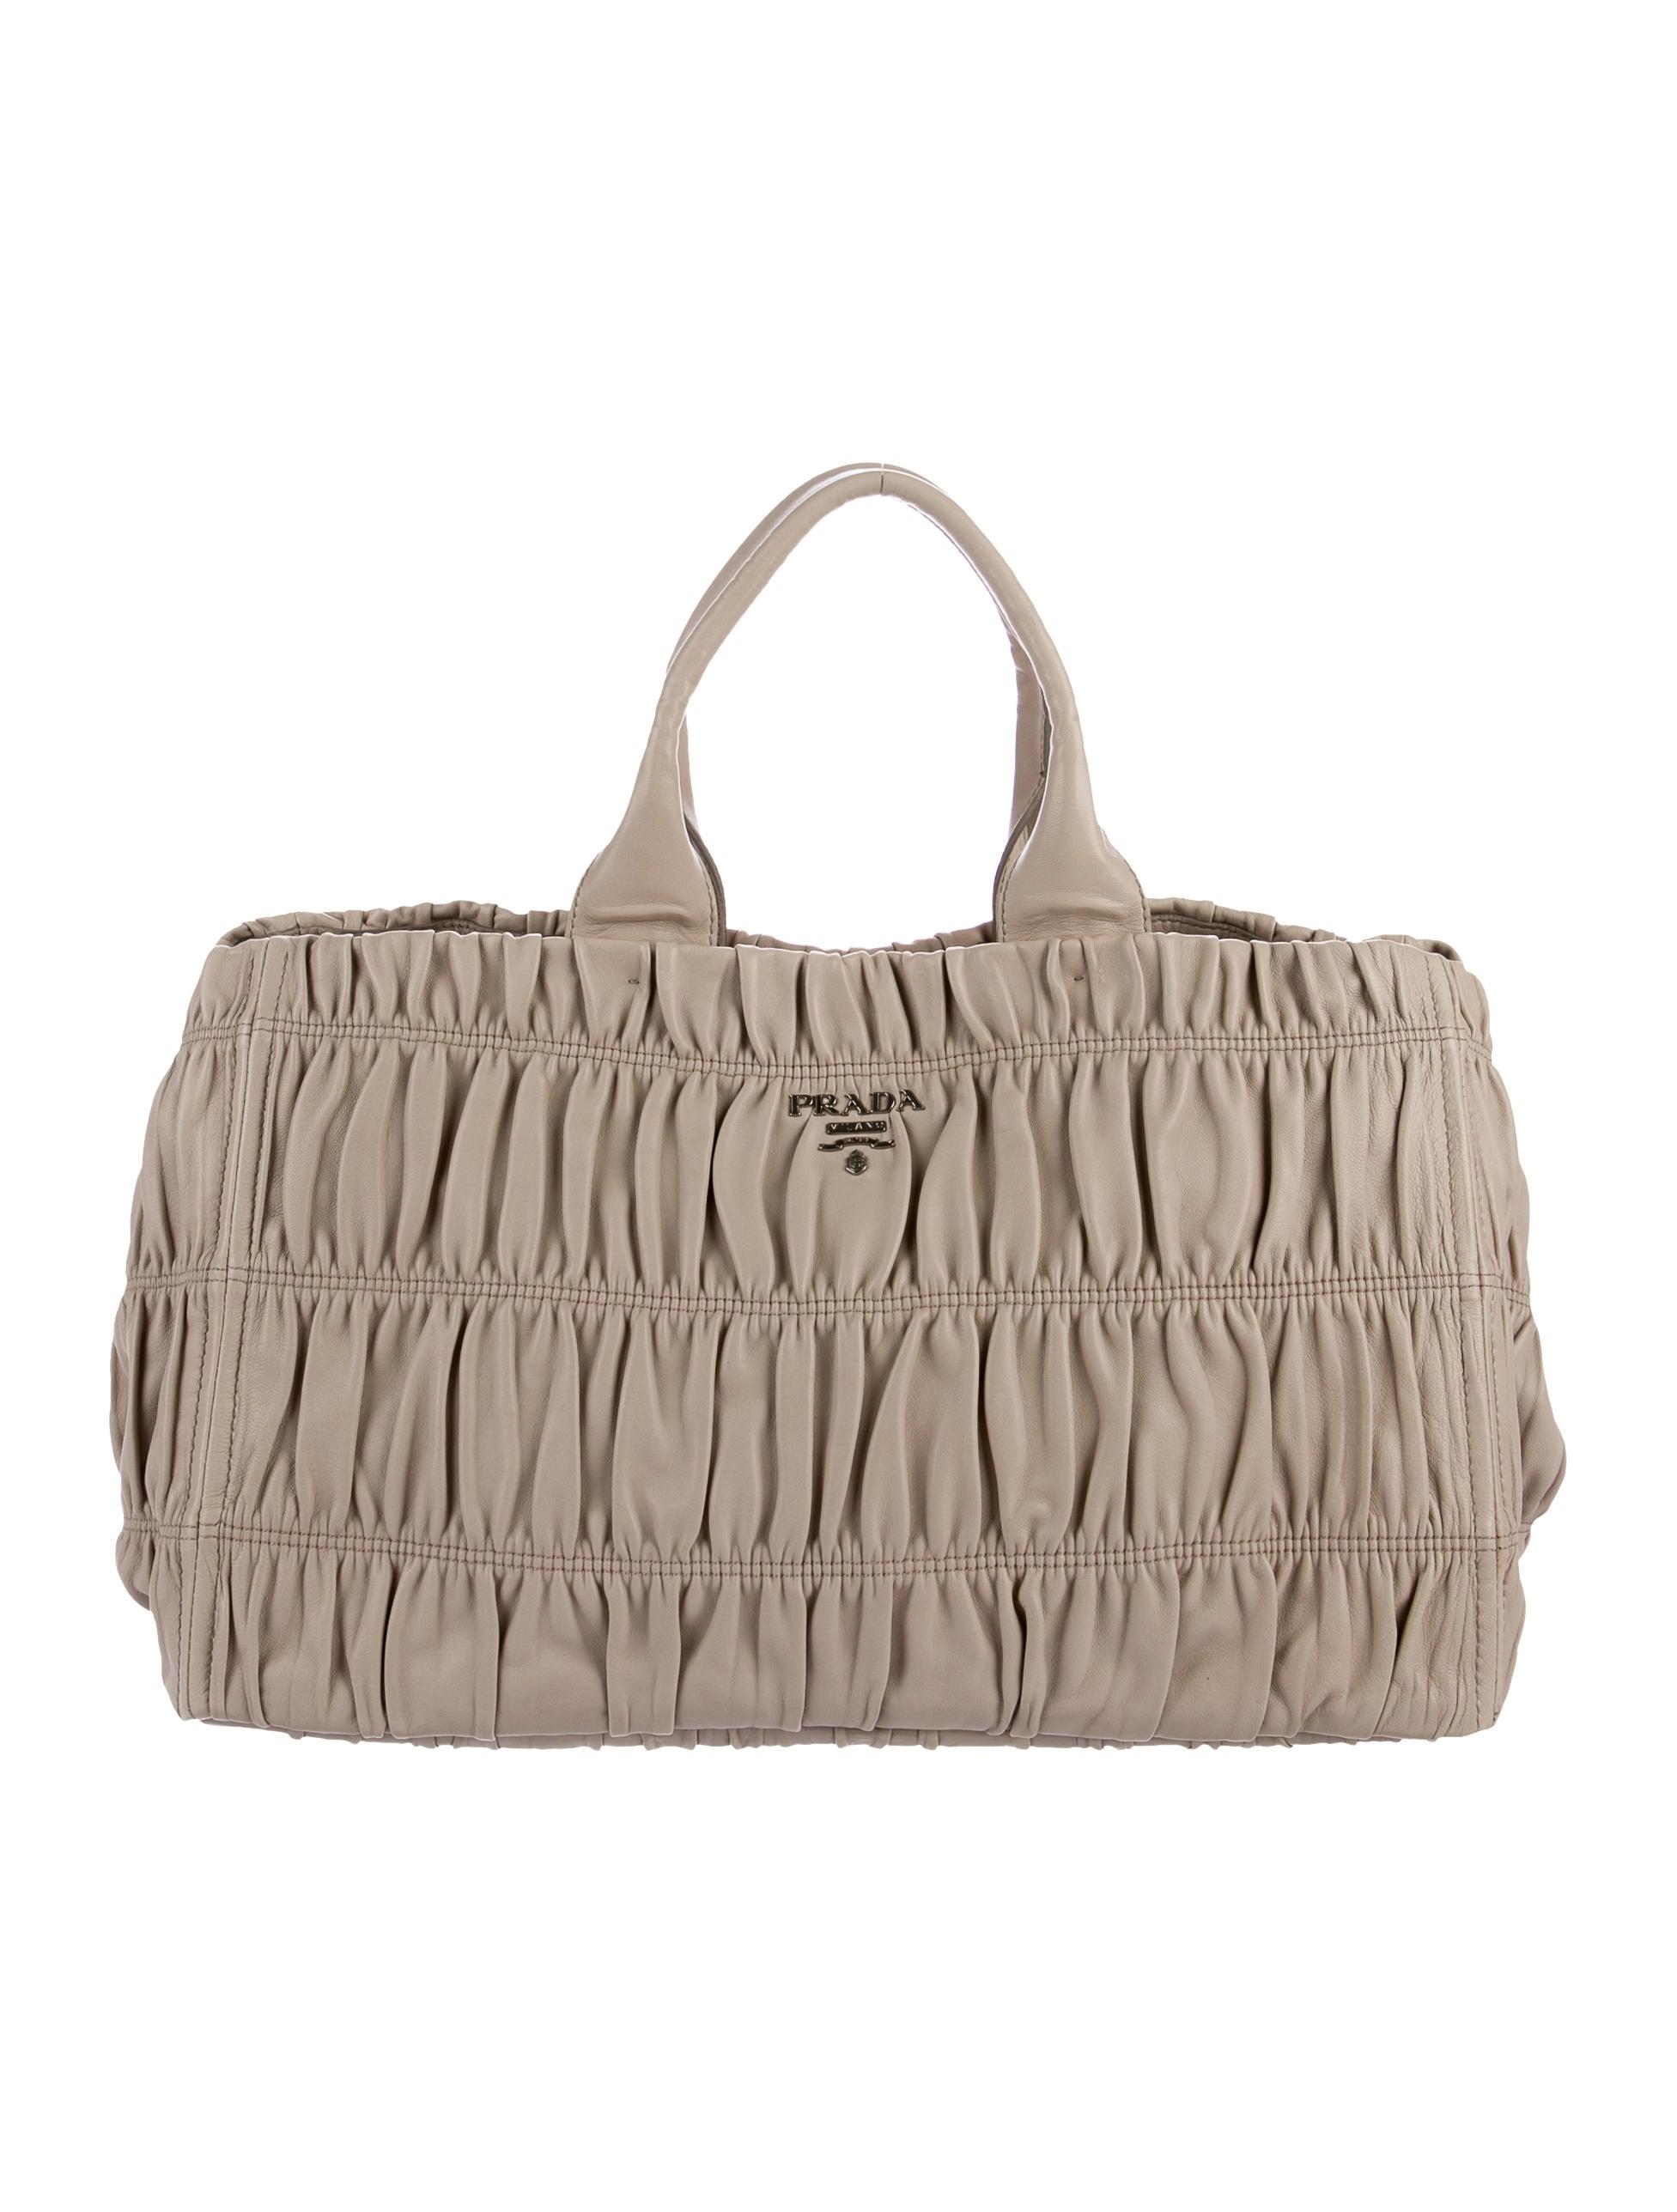 376986925481 Prada Nappa Gaufre Tote - Handbags - PRA159556   The RealReal